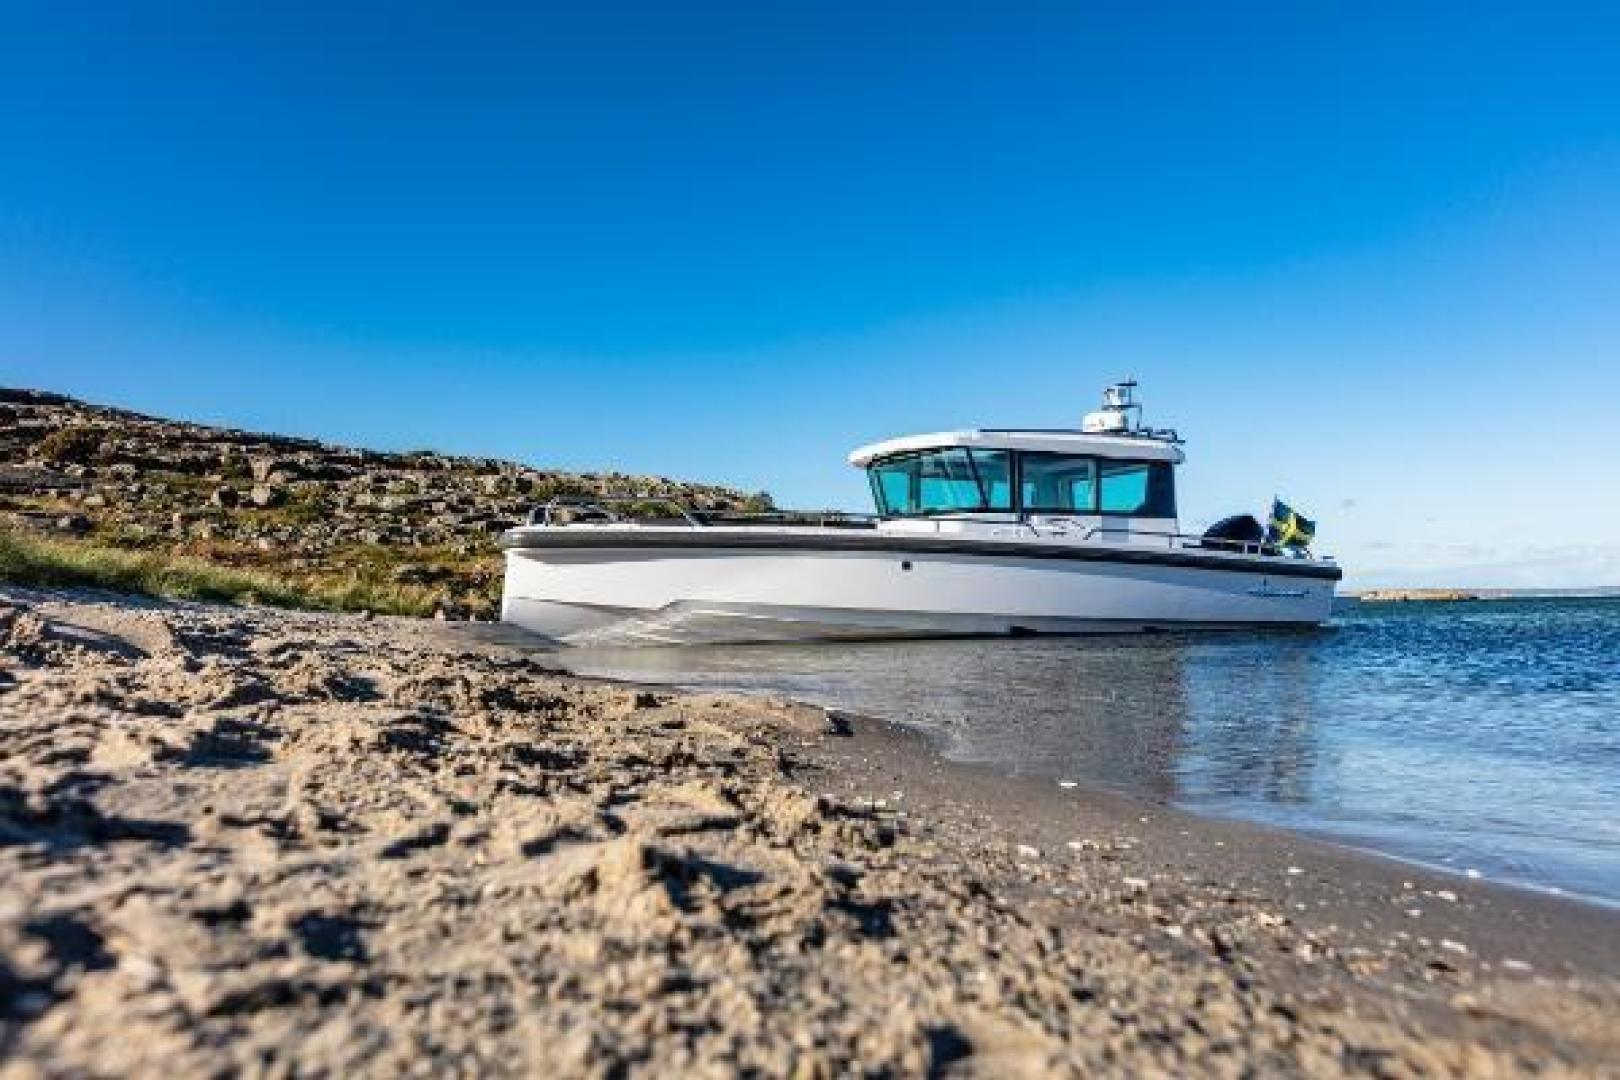 Axopar-28 CABIN 2020-Axopar 28 CABIN Fort Lauderdale-Florida-United States-1531664   Thumbnail